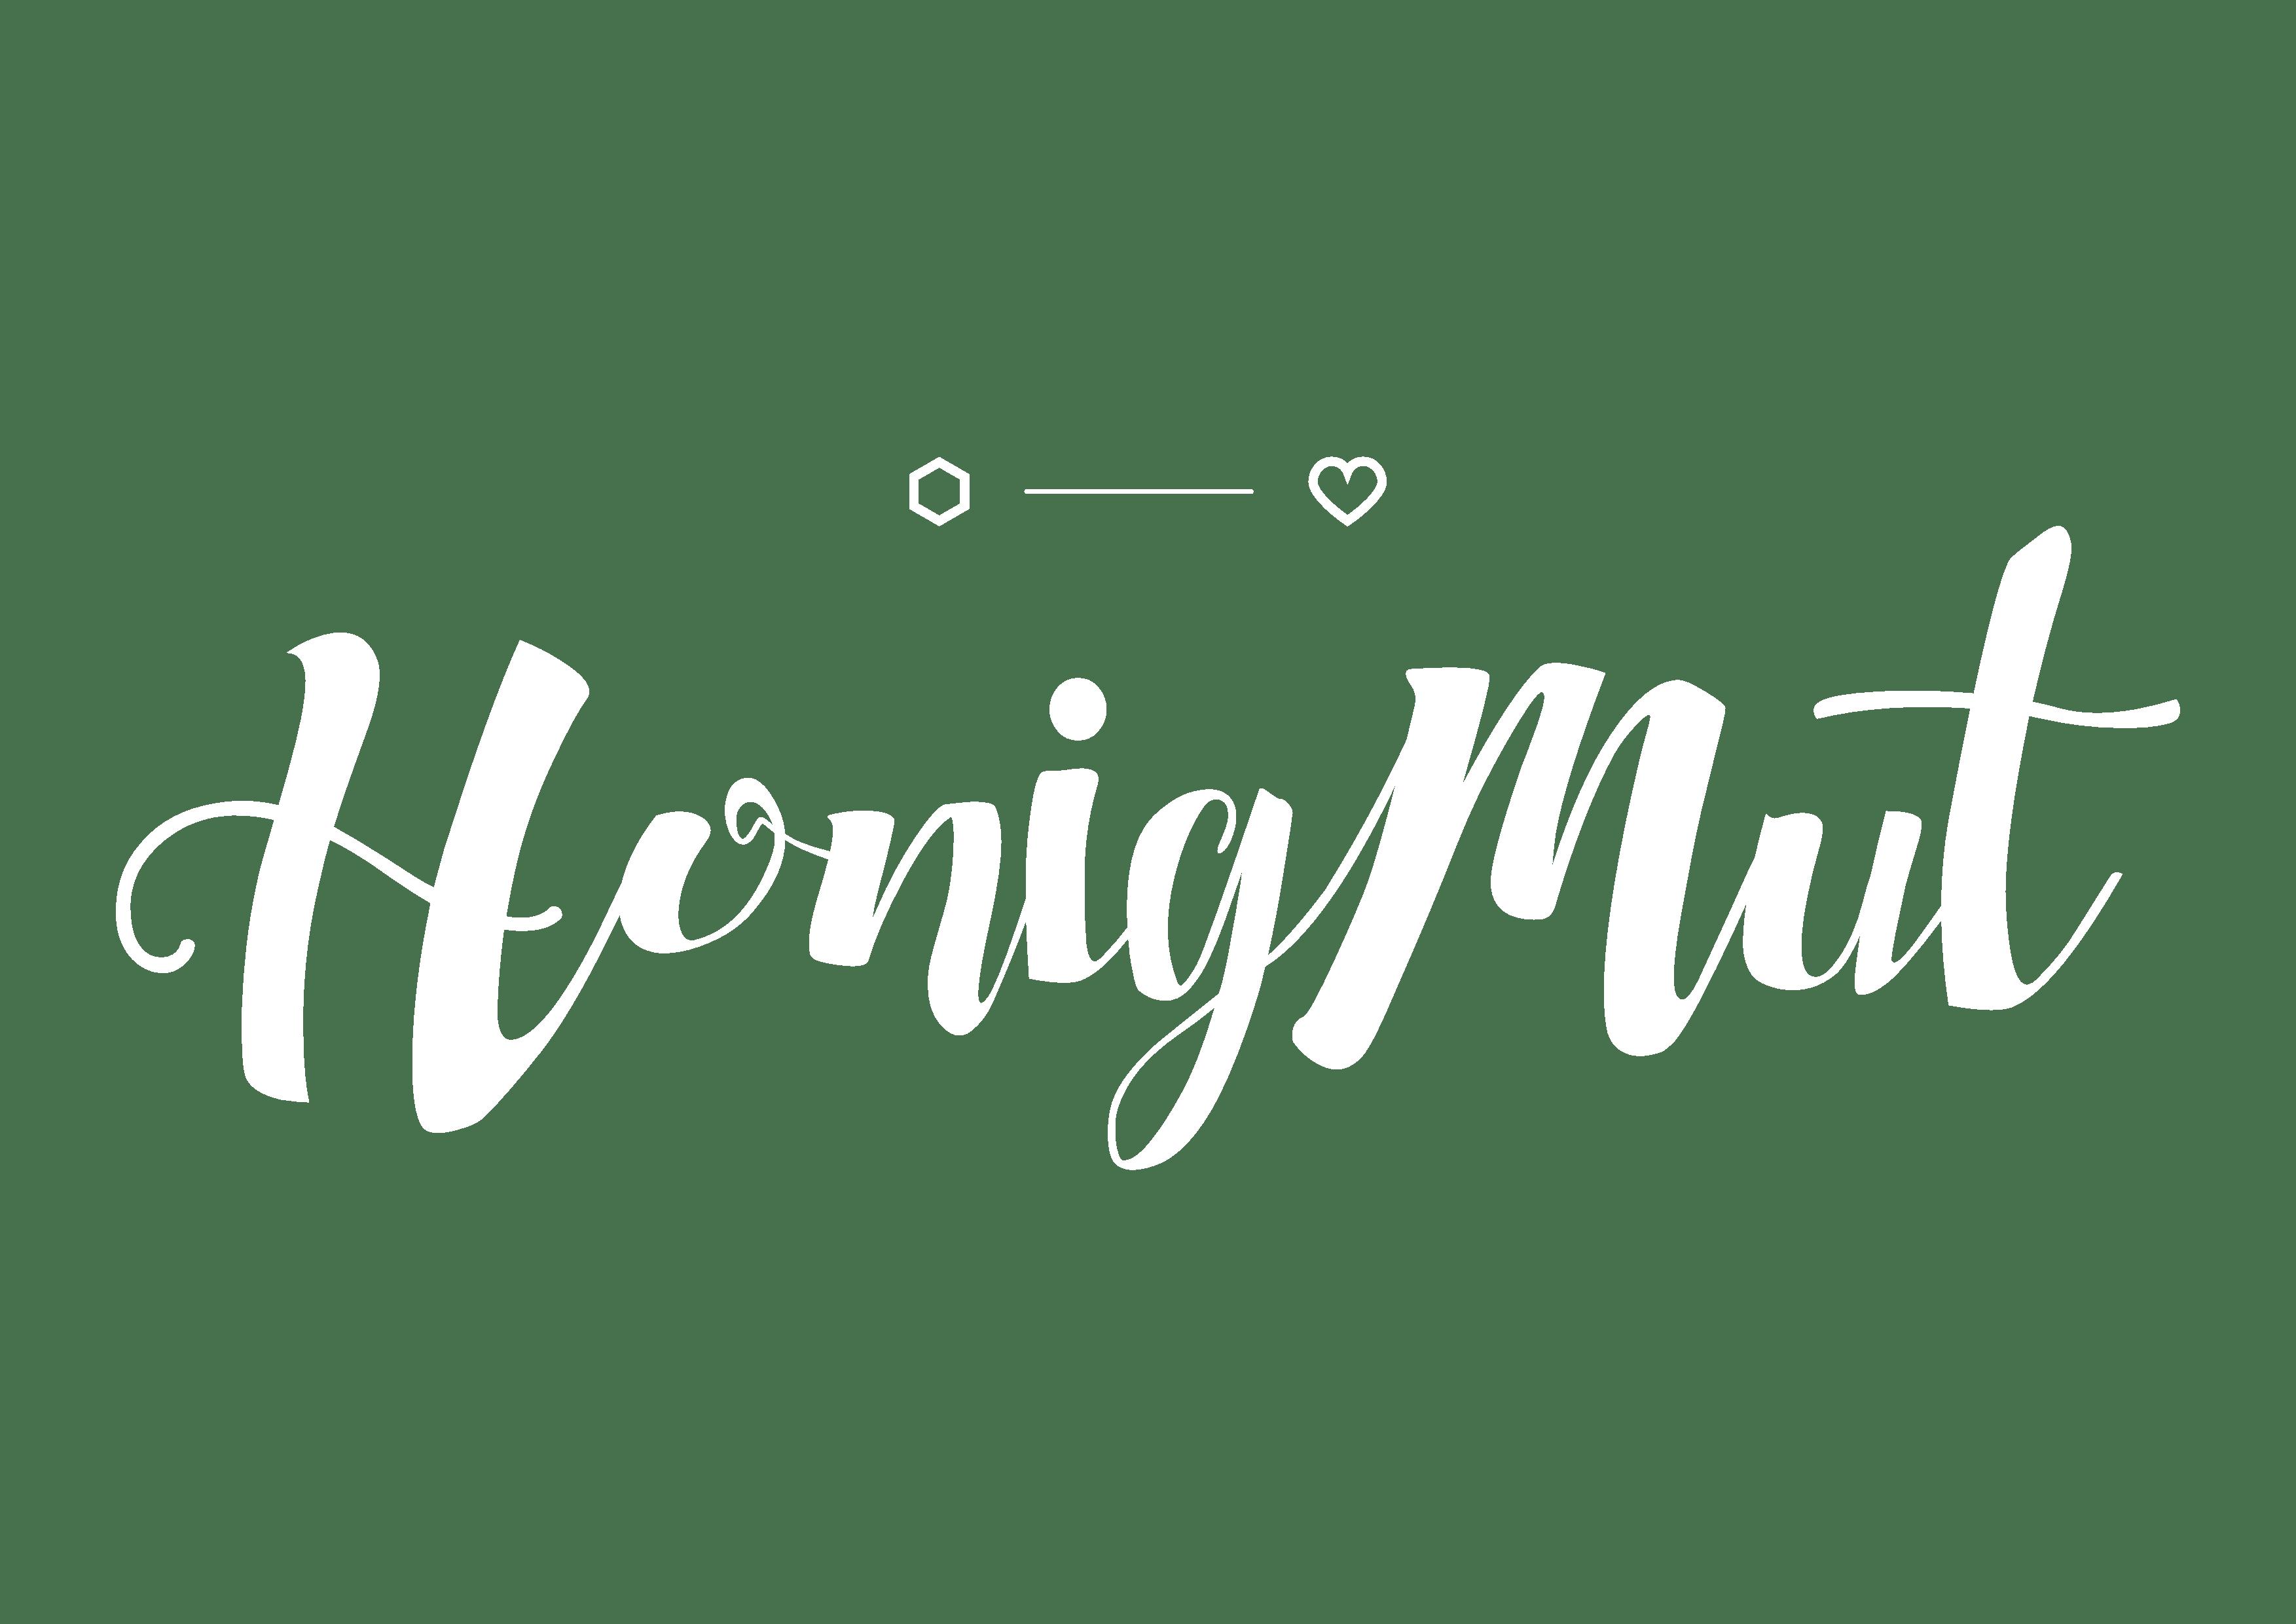 HonigMut